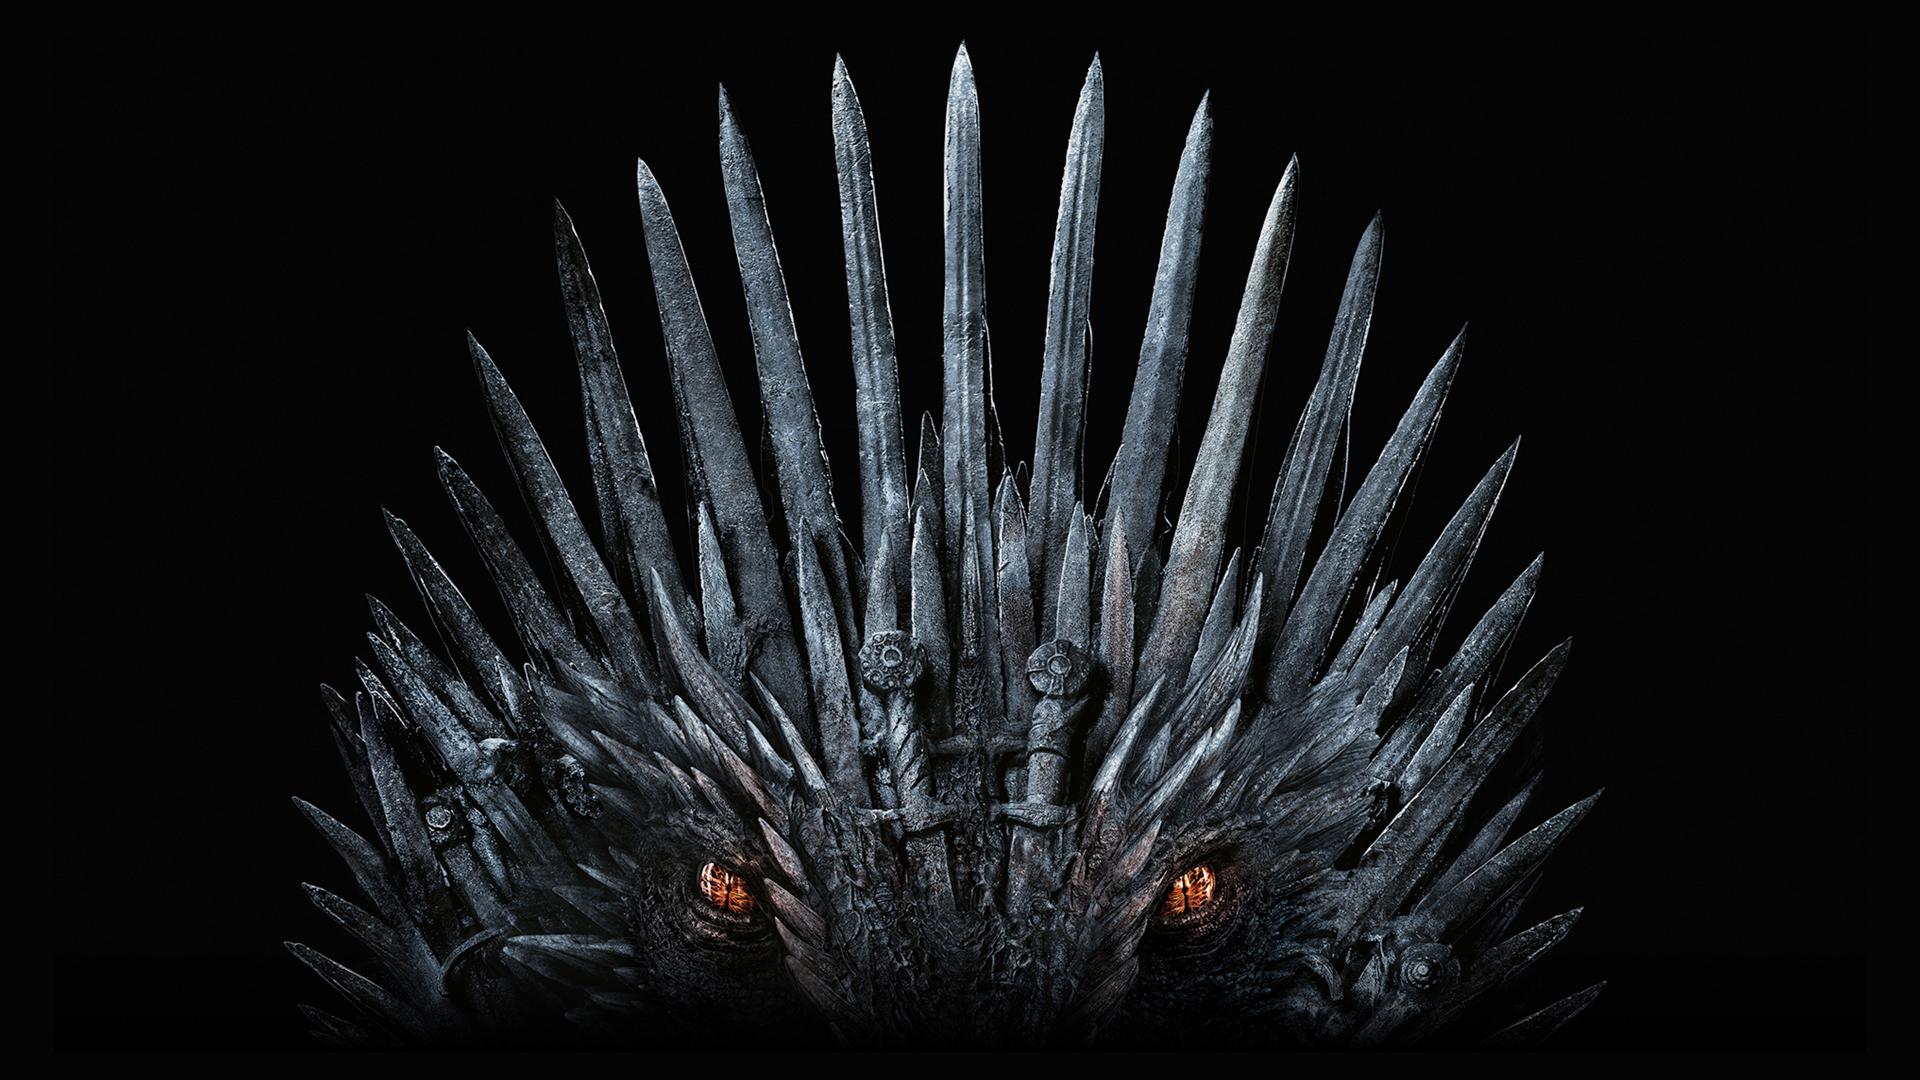 1920x1080 Game Of Thrones Season 8 1080p Laptop Full Hd